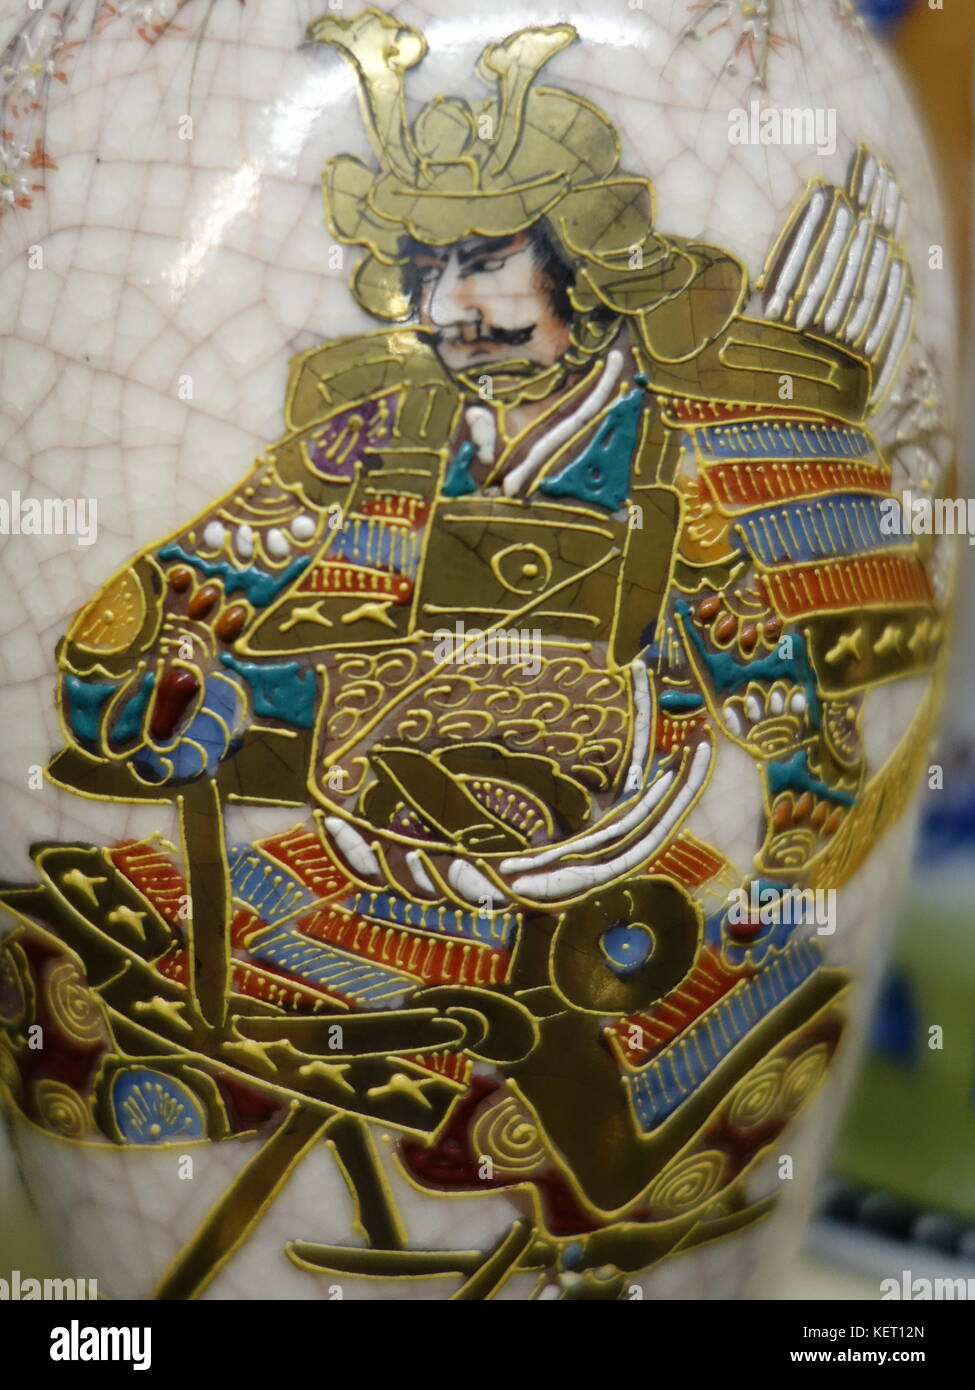 Ein vergoldetes Samurai Bild Stockbild